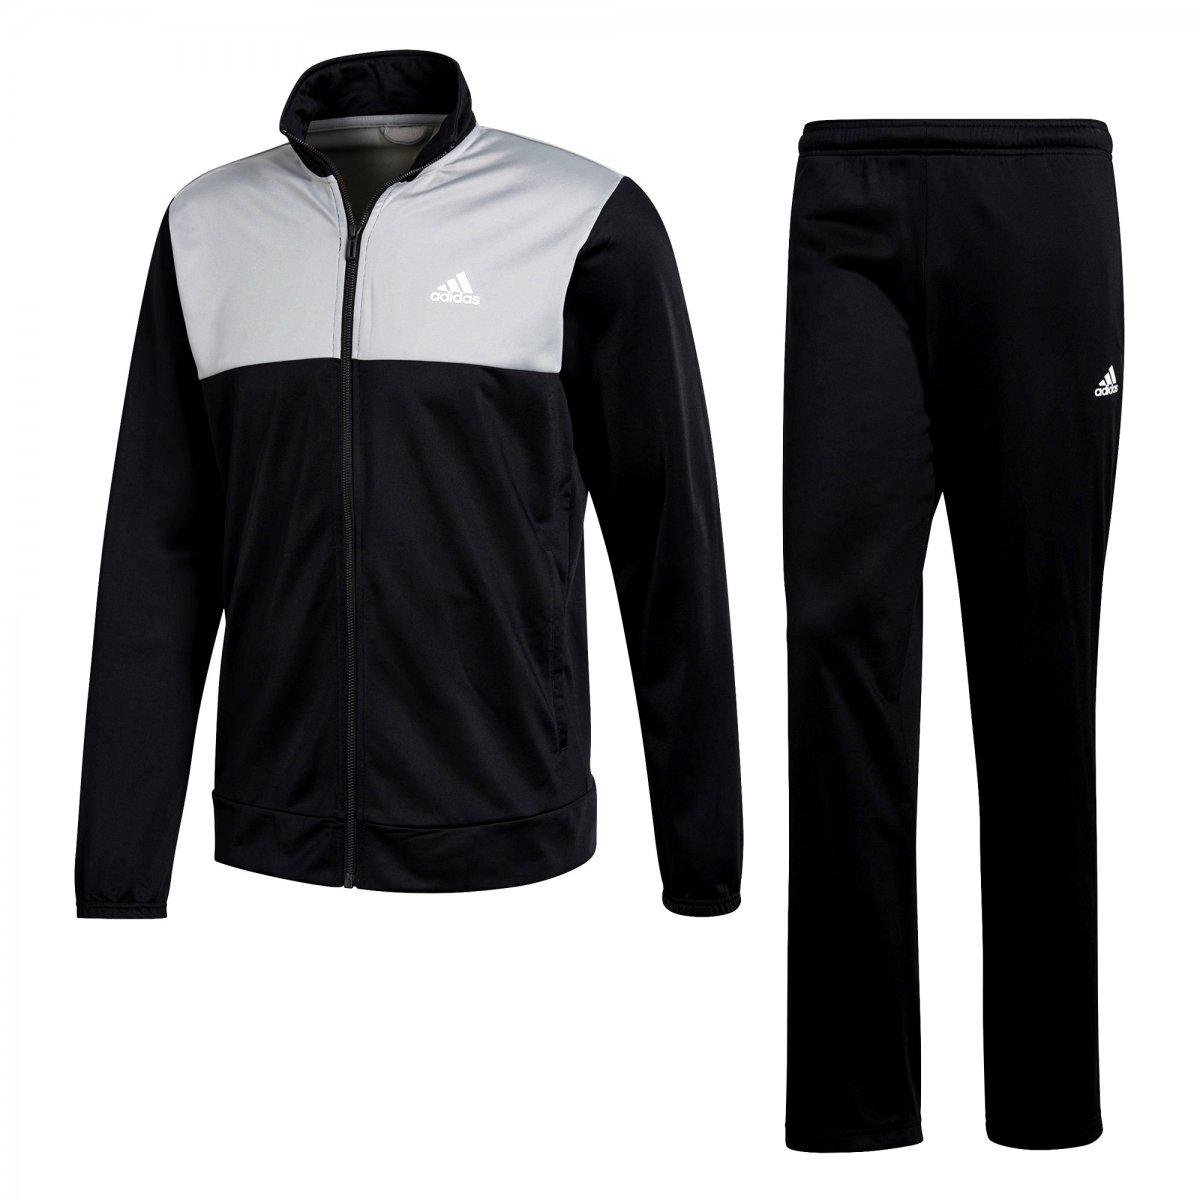 Agasalho Masculino Adidas Back 2 Basics CF1615 - Preto Branco ... 95fa604f2c4